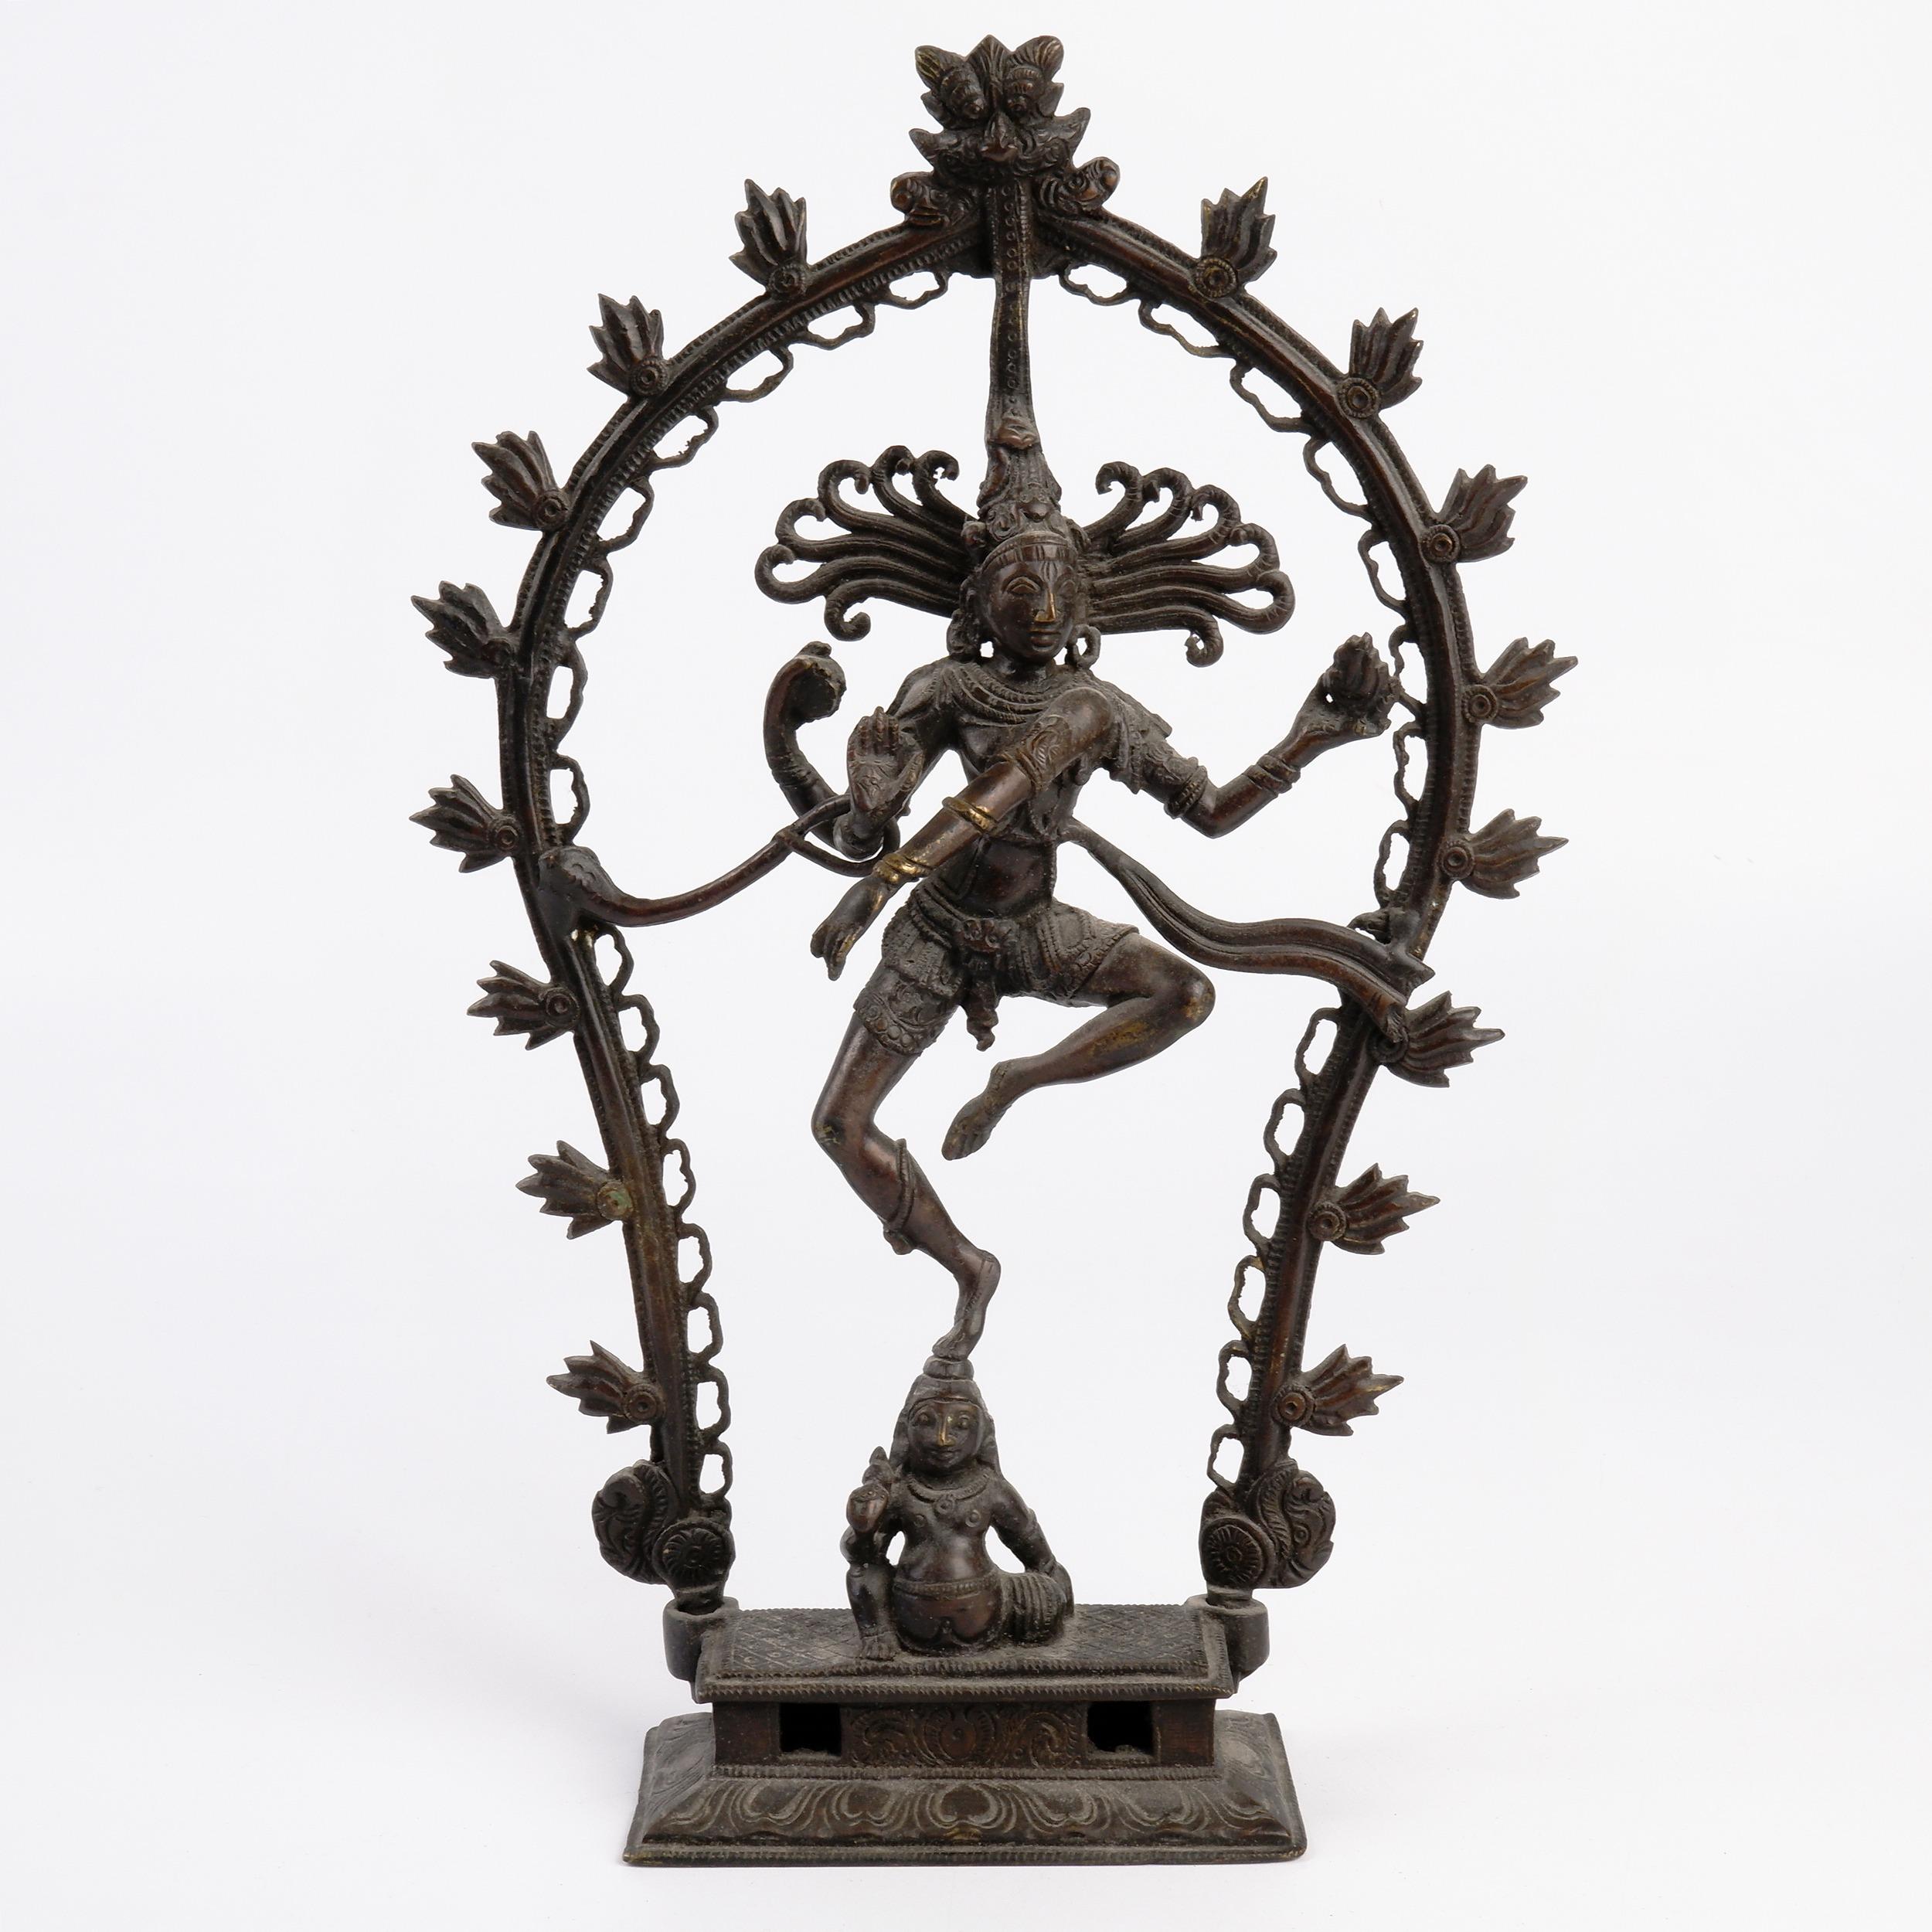 'Indian Cast Bronze Figure of Shiva Nataraja, Lord of the Dance'